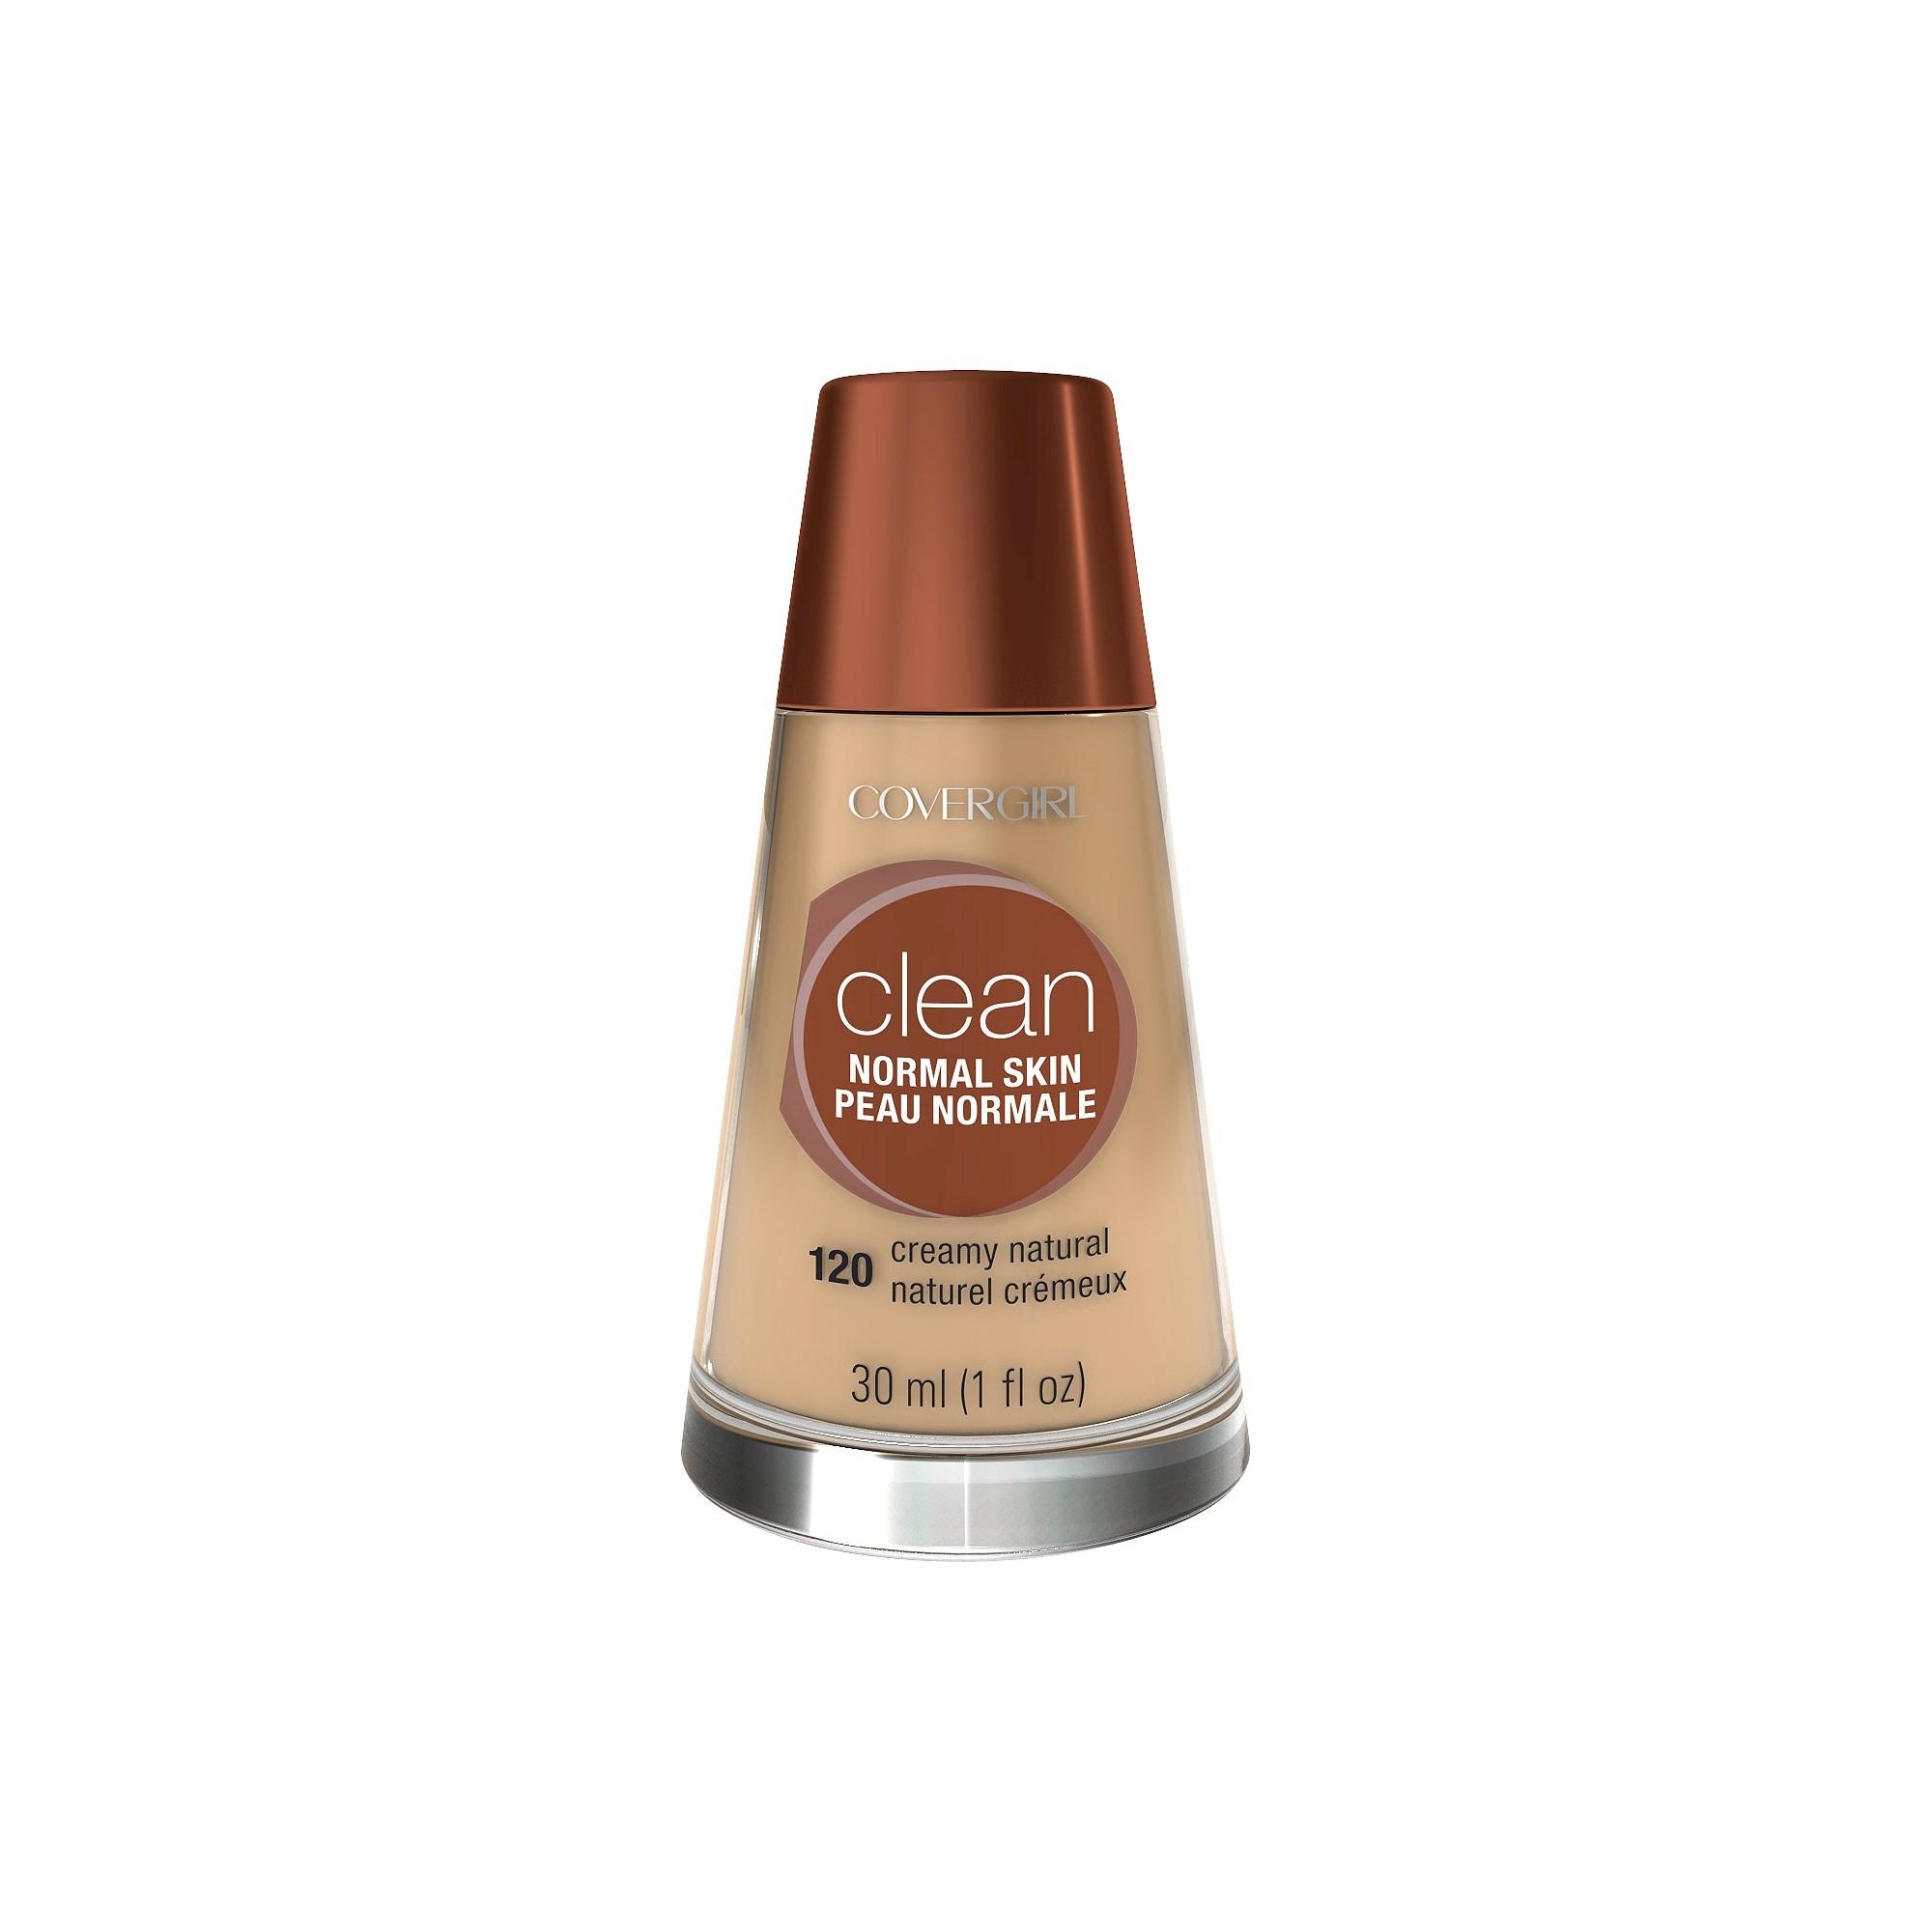 COVERGIRL Clean Foundation 120 Creamy Natural 1 fl oz